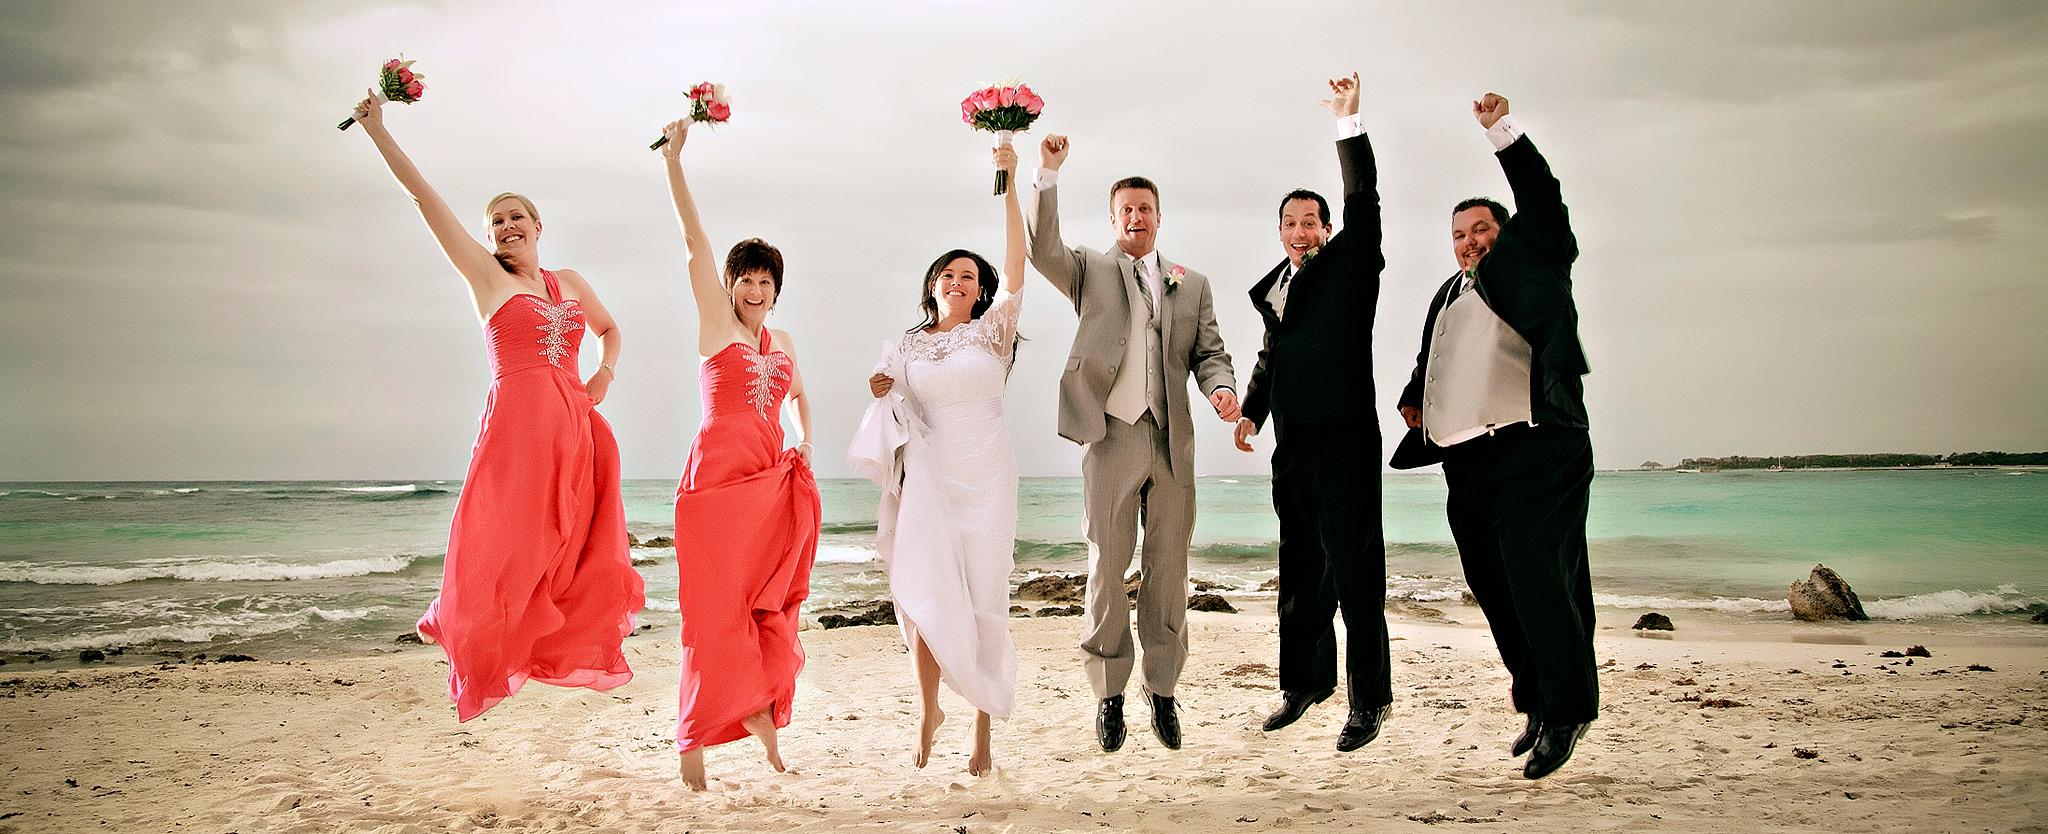 photographe-mariage-cortege-plage-riviera-maya-mexique-stephane-lariviere-photo-photographie-rigaud